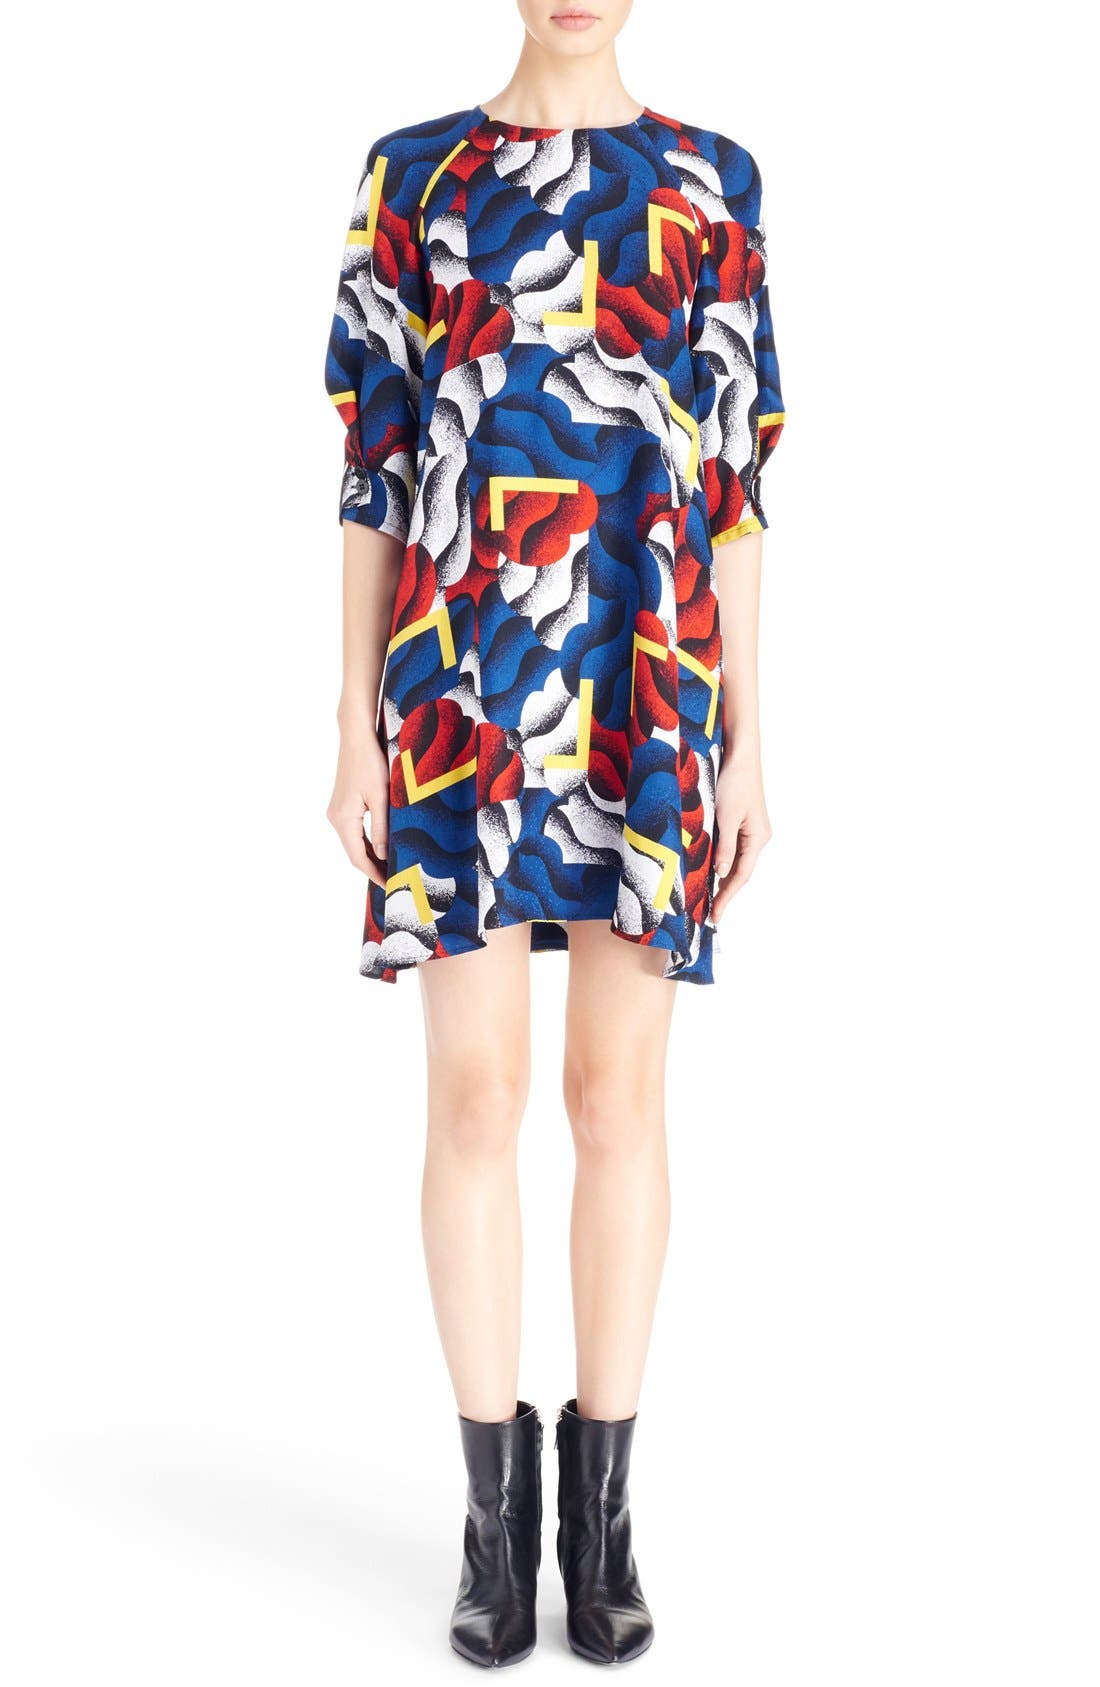 Main Image - KENZO 'Clouds & Corners' Print Silk Dress